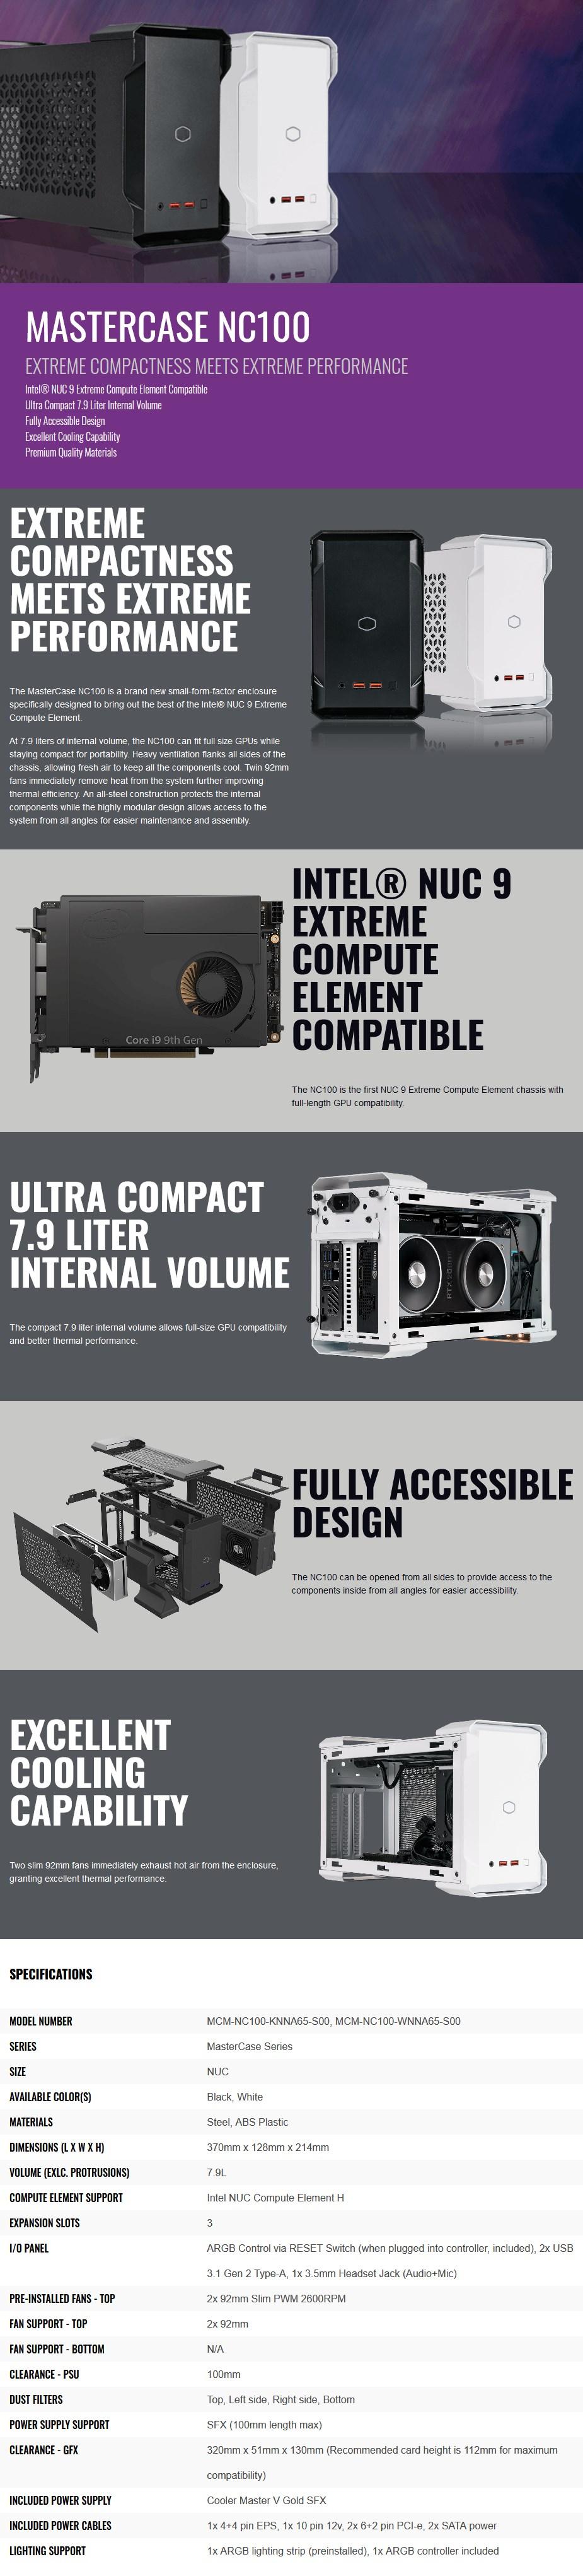 cooler-master-mastercase-nc100-compact-case-black-ac36476-13.jpg